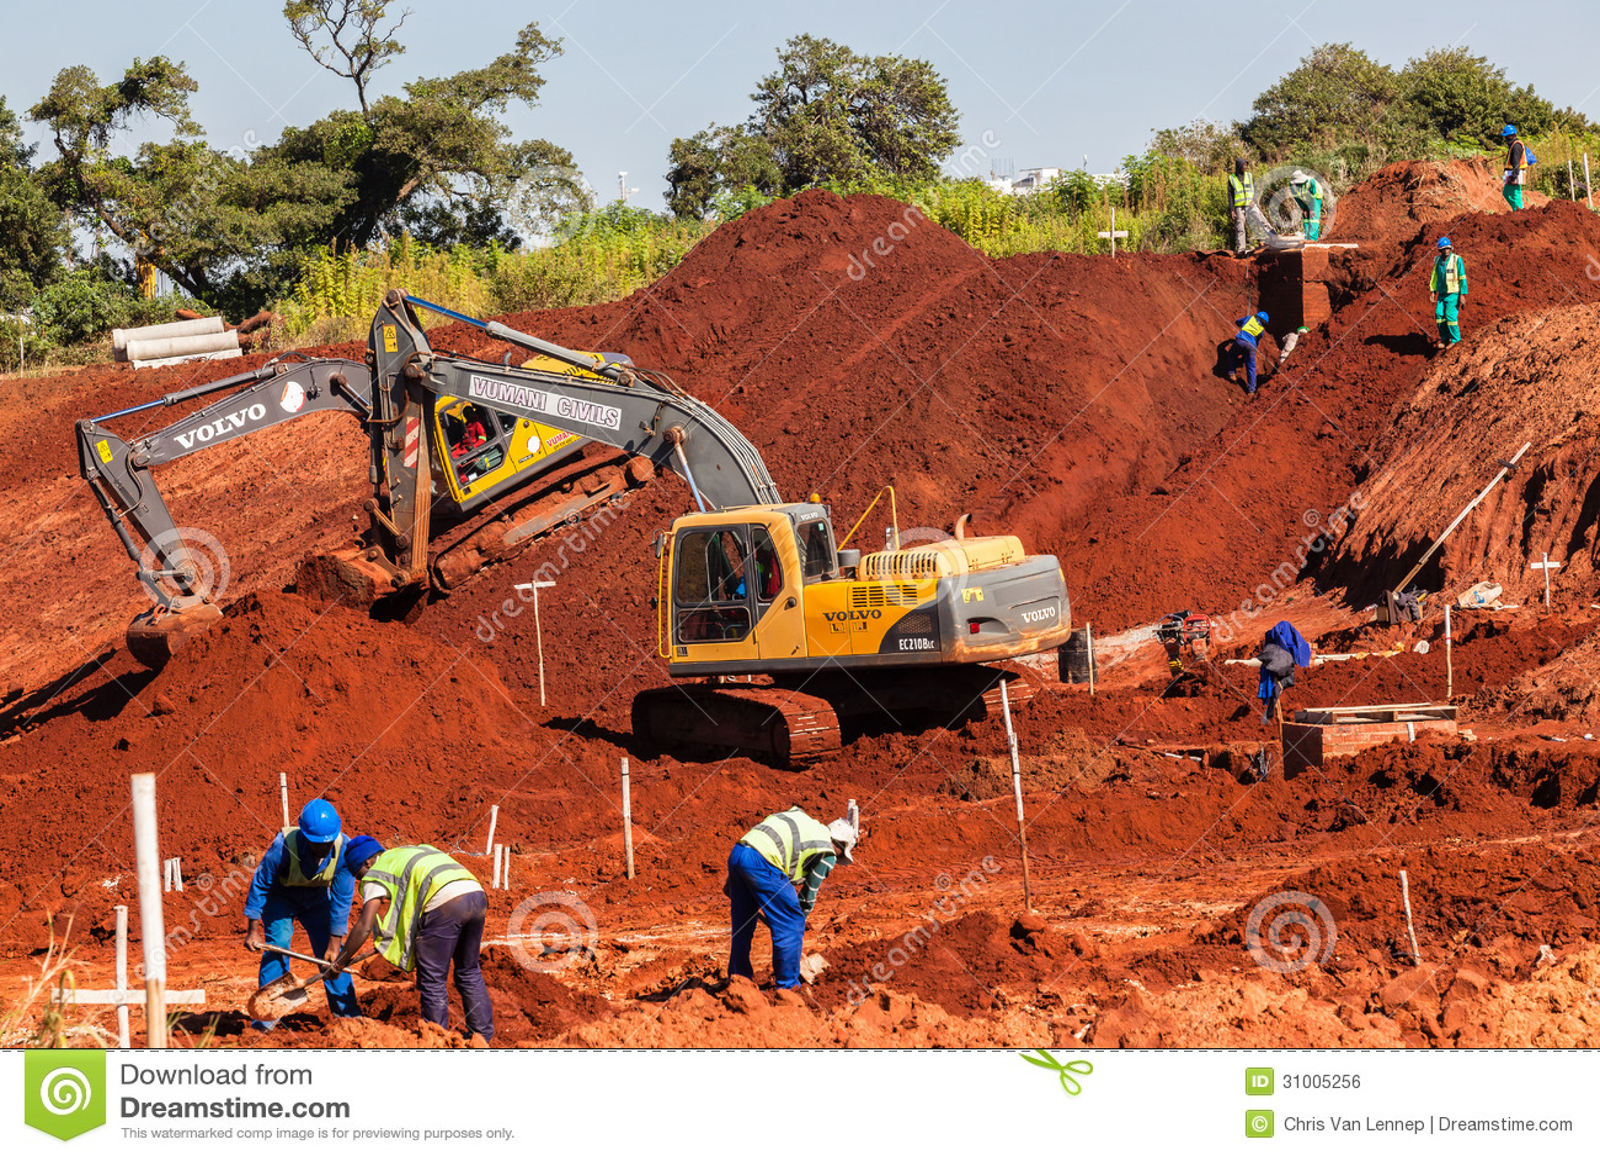 Earthwork Construction Management : Breaking ground excavators construction editorial photo